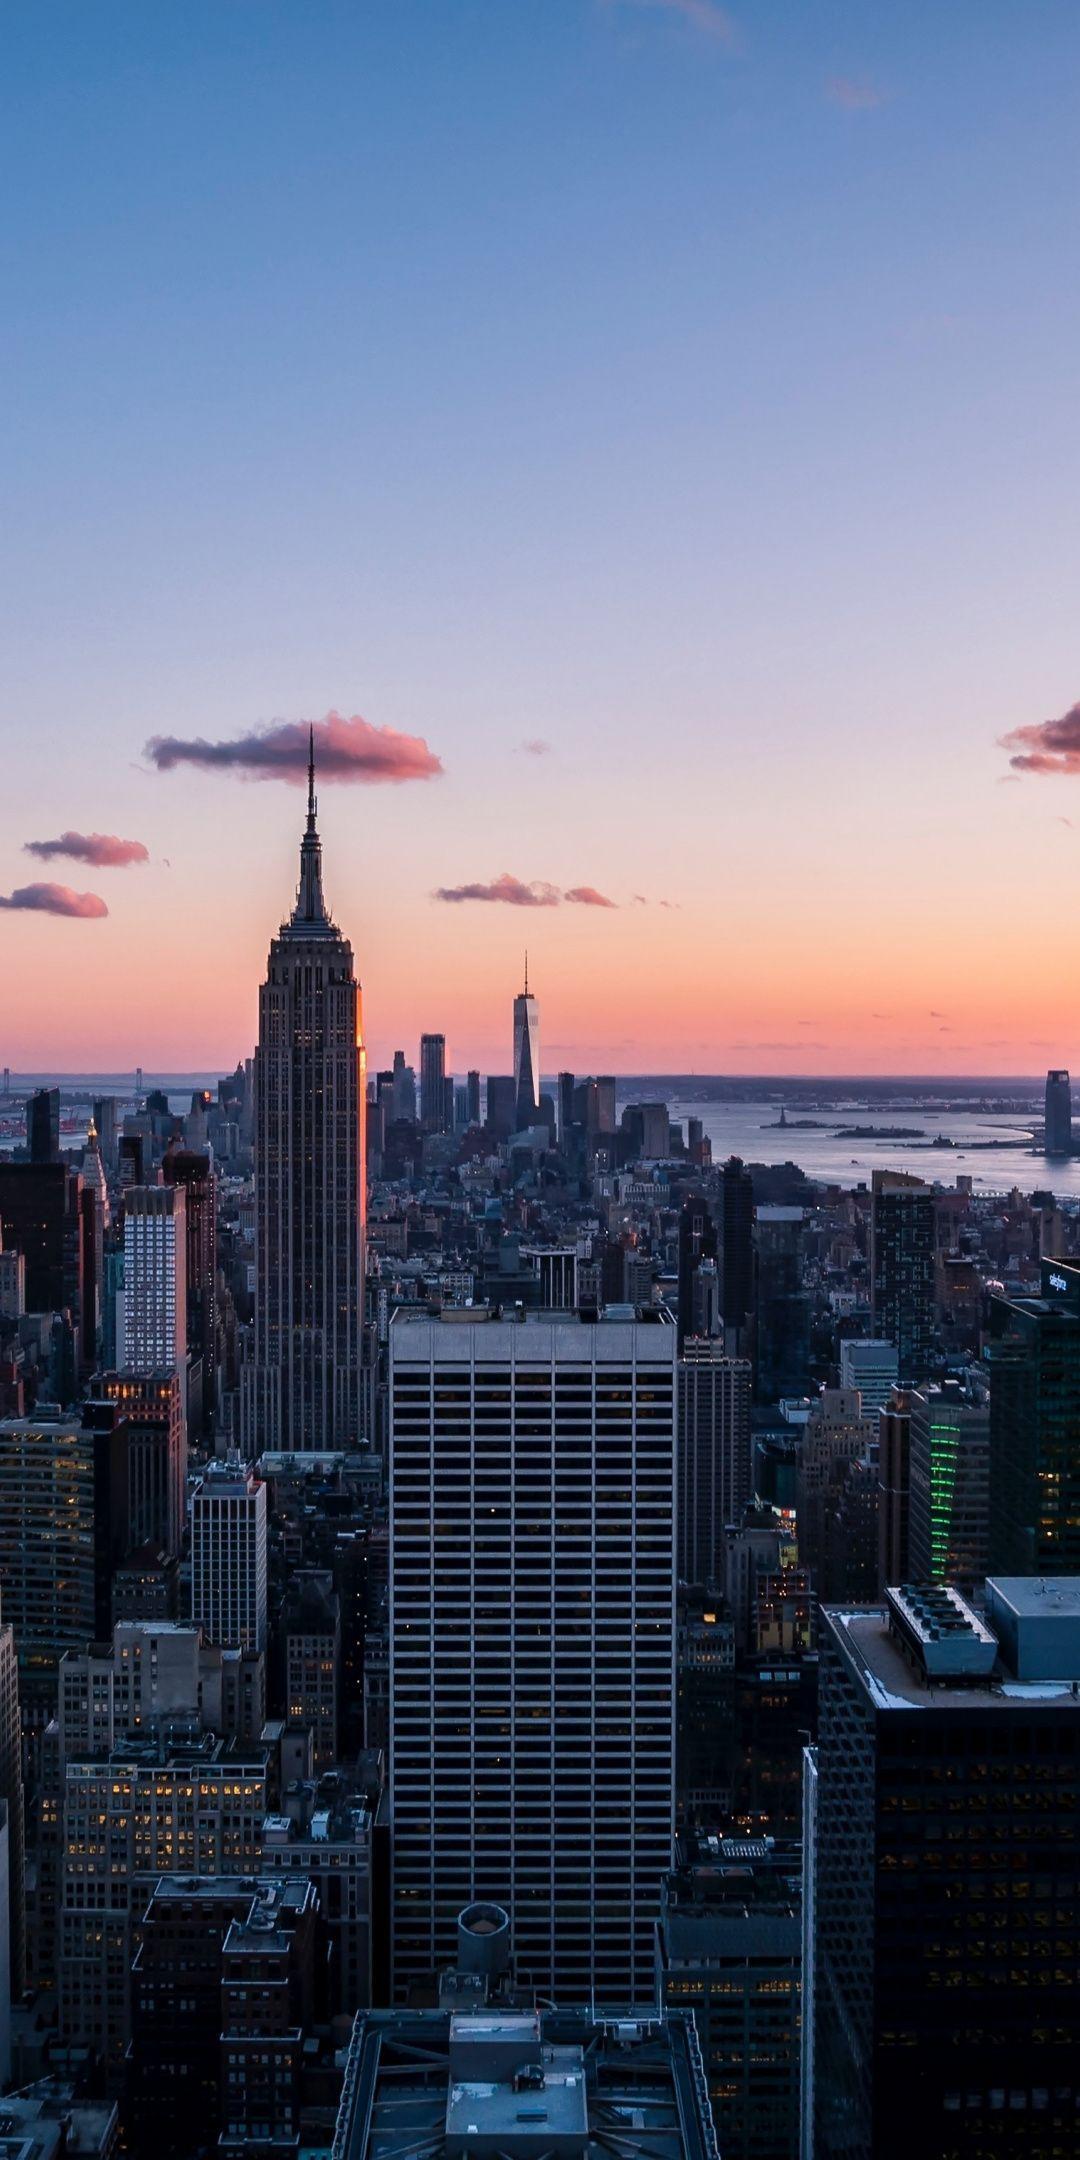 Cityscape Evening Buildings New York 1080x2160 Wallpaper 1080x2160 Buildings Cityscape Evening Wall New York Wallpaper York Wallpaper City Aesthetic